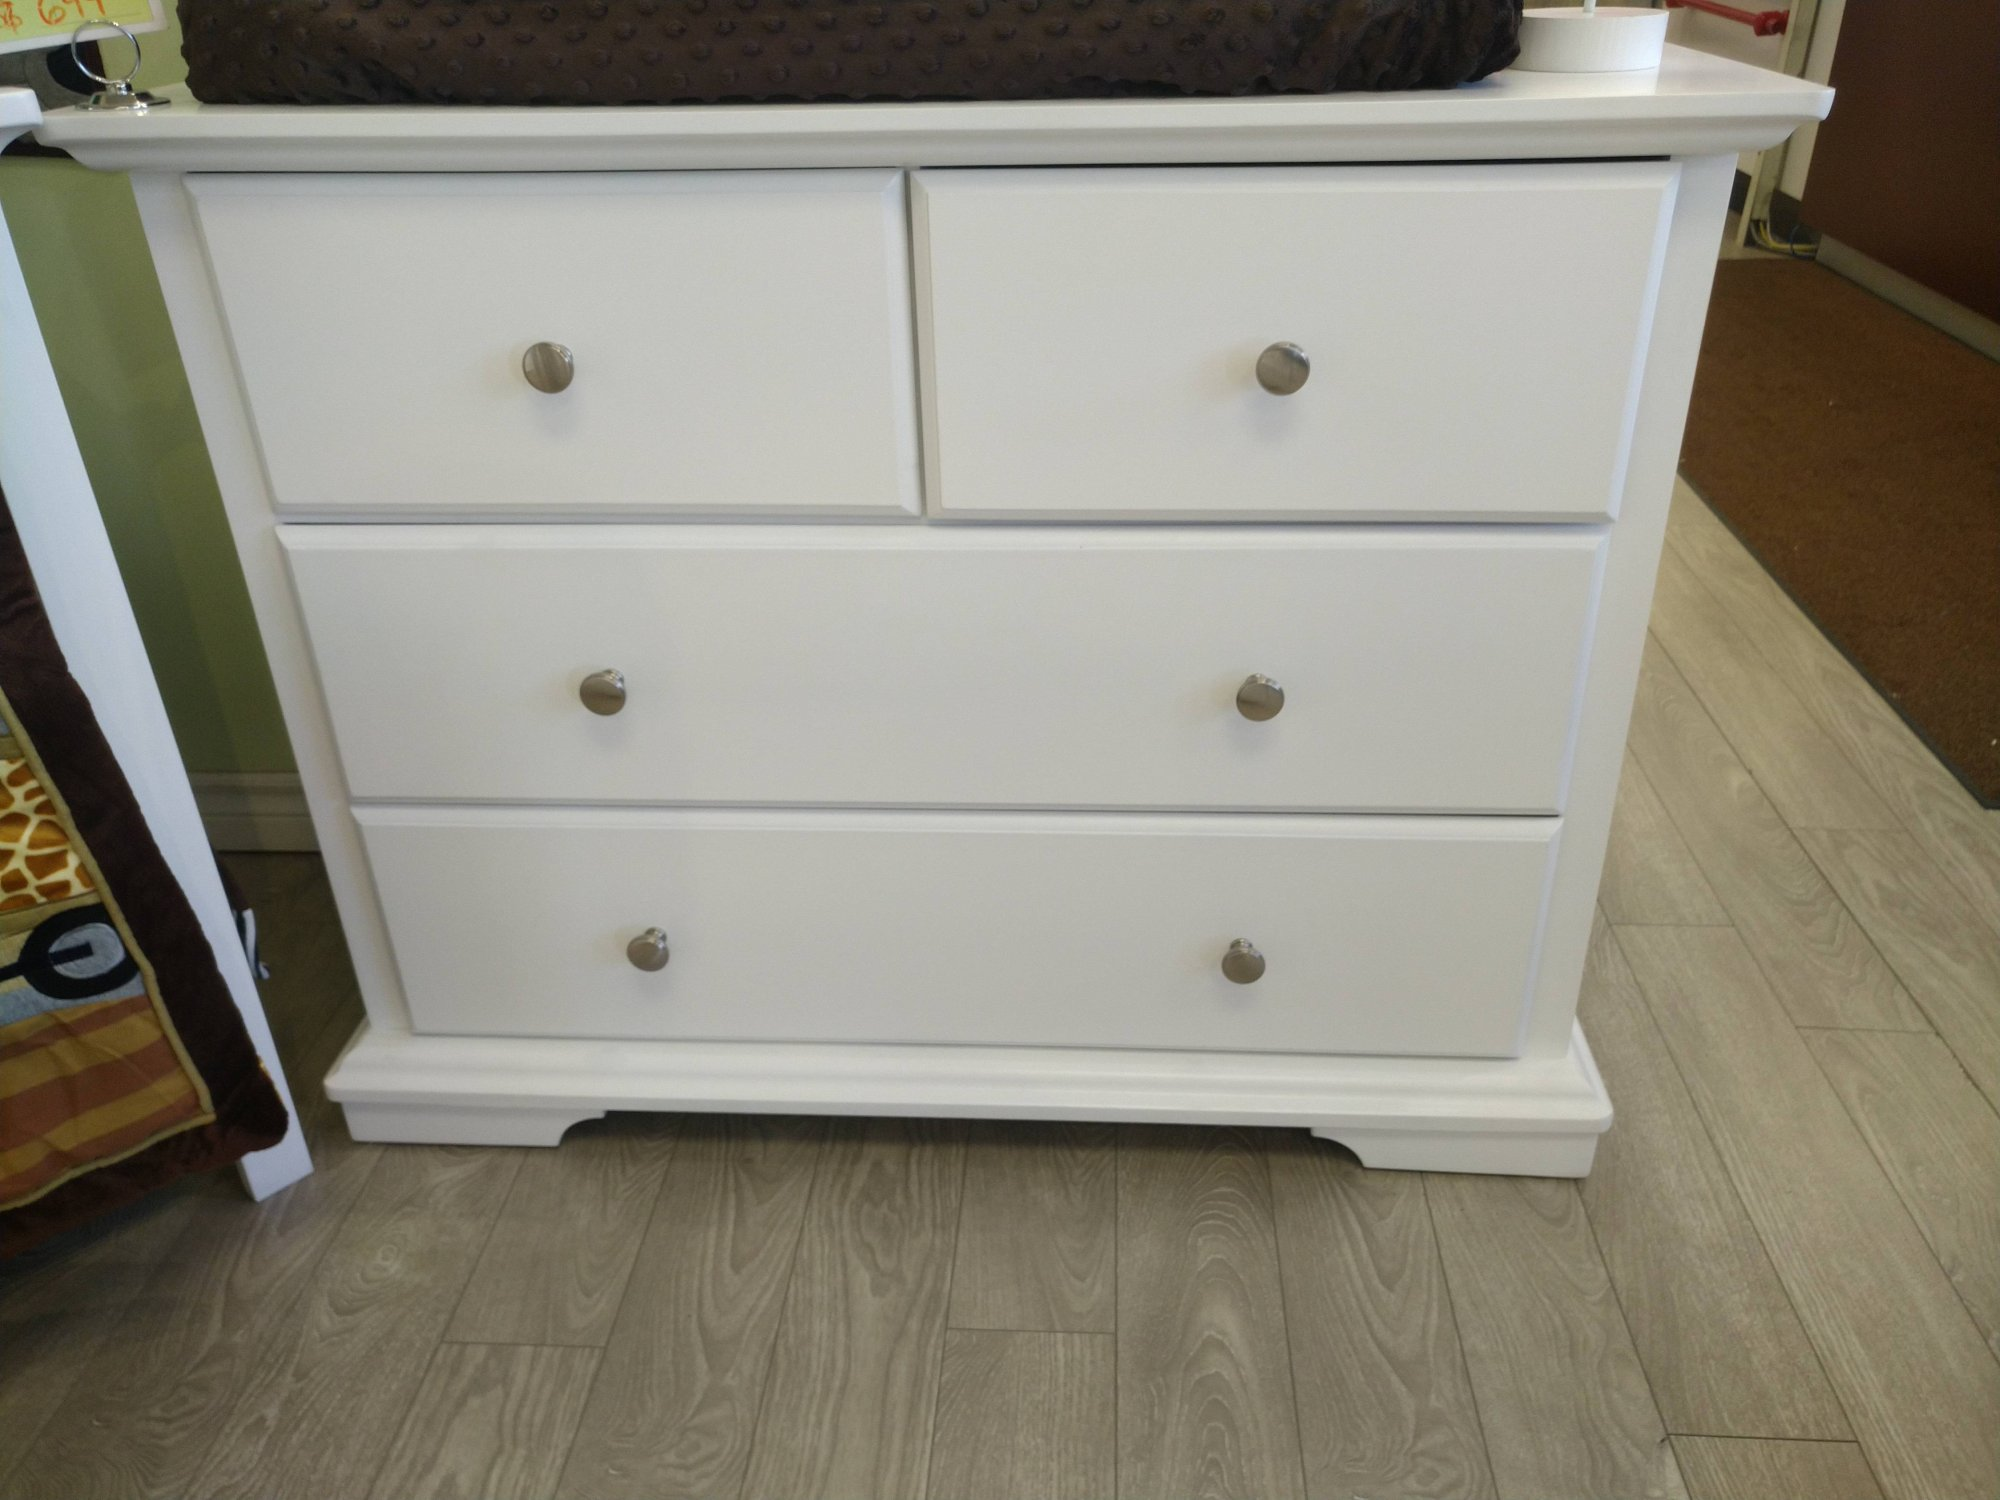 Devon 3 Drawer Dresser - White (CURBSIDE PICK-UP ONLY)